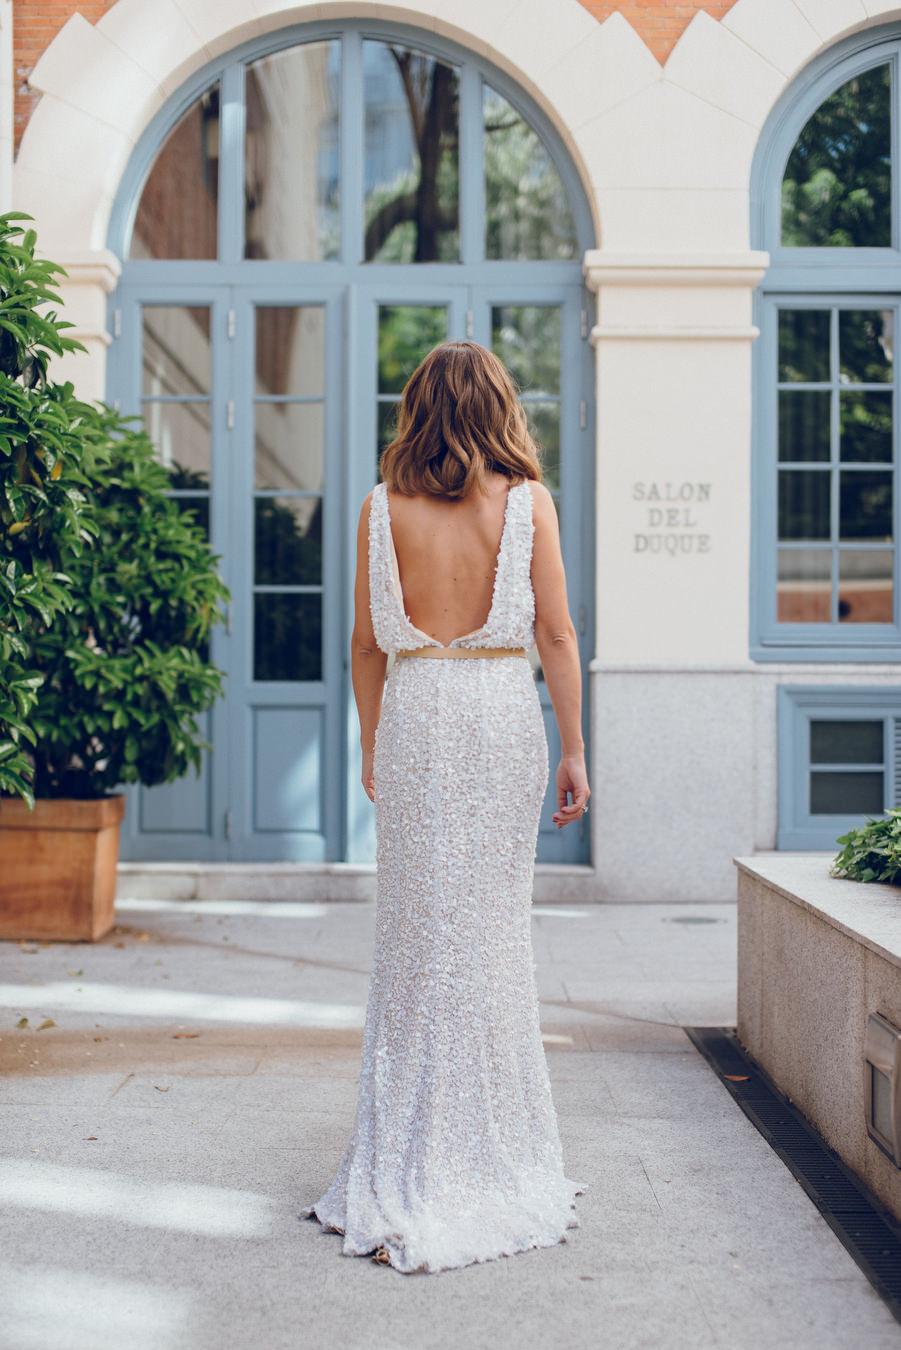 calista-one-lista-de-bodas-online-blog-de-bodas-bossanova-looks-invitadas-pepe-botella-12